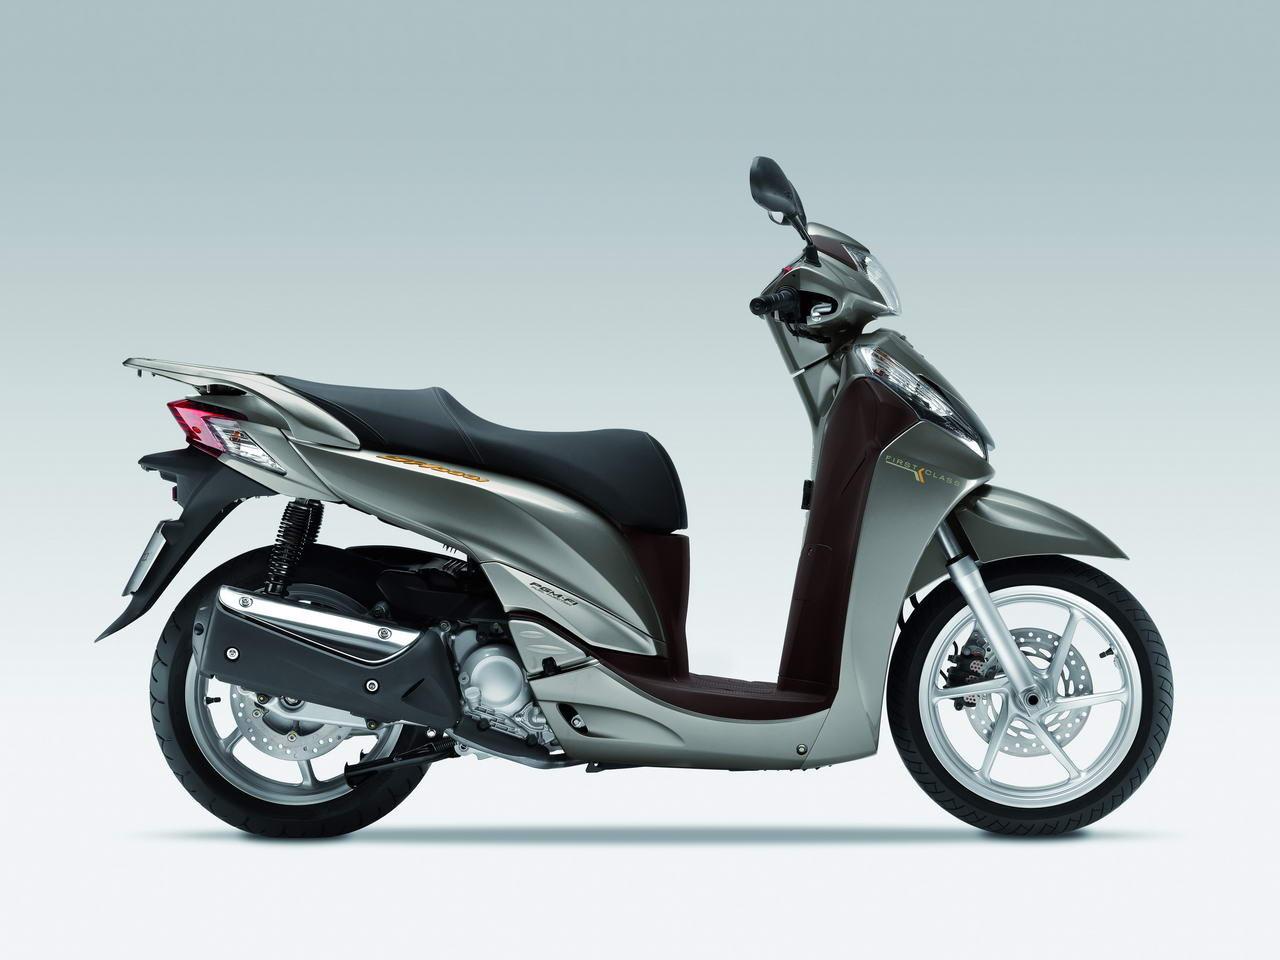 Listino Honda Crosstourer ABS Granturismo on-off - image 14722_honda-sh300i on http://moto.motori.net